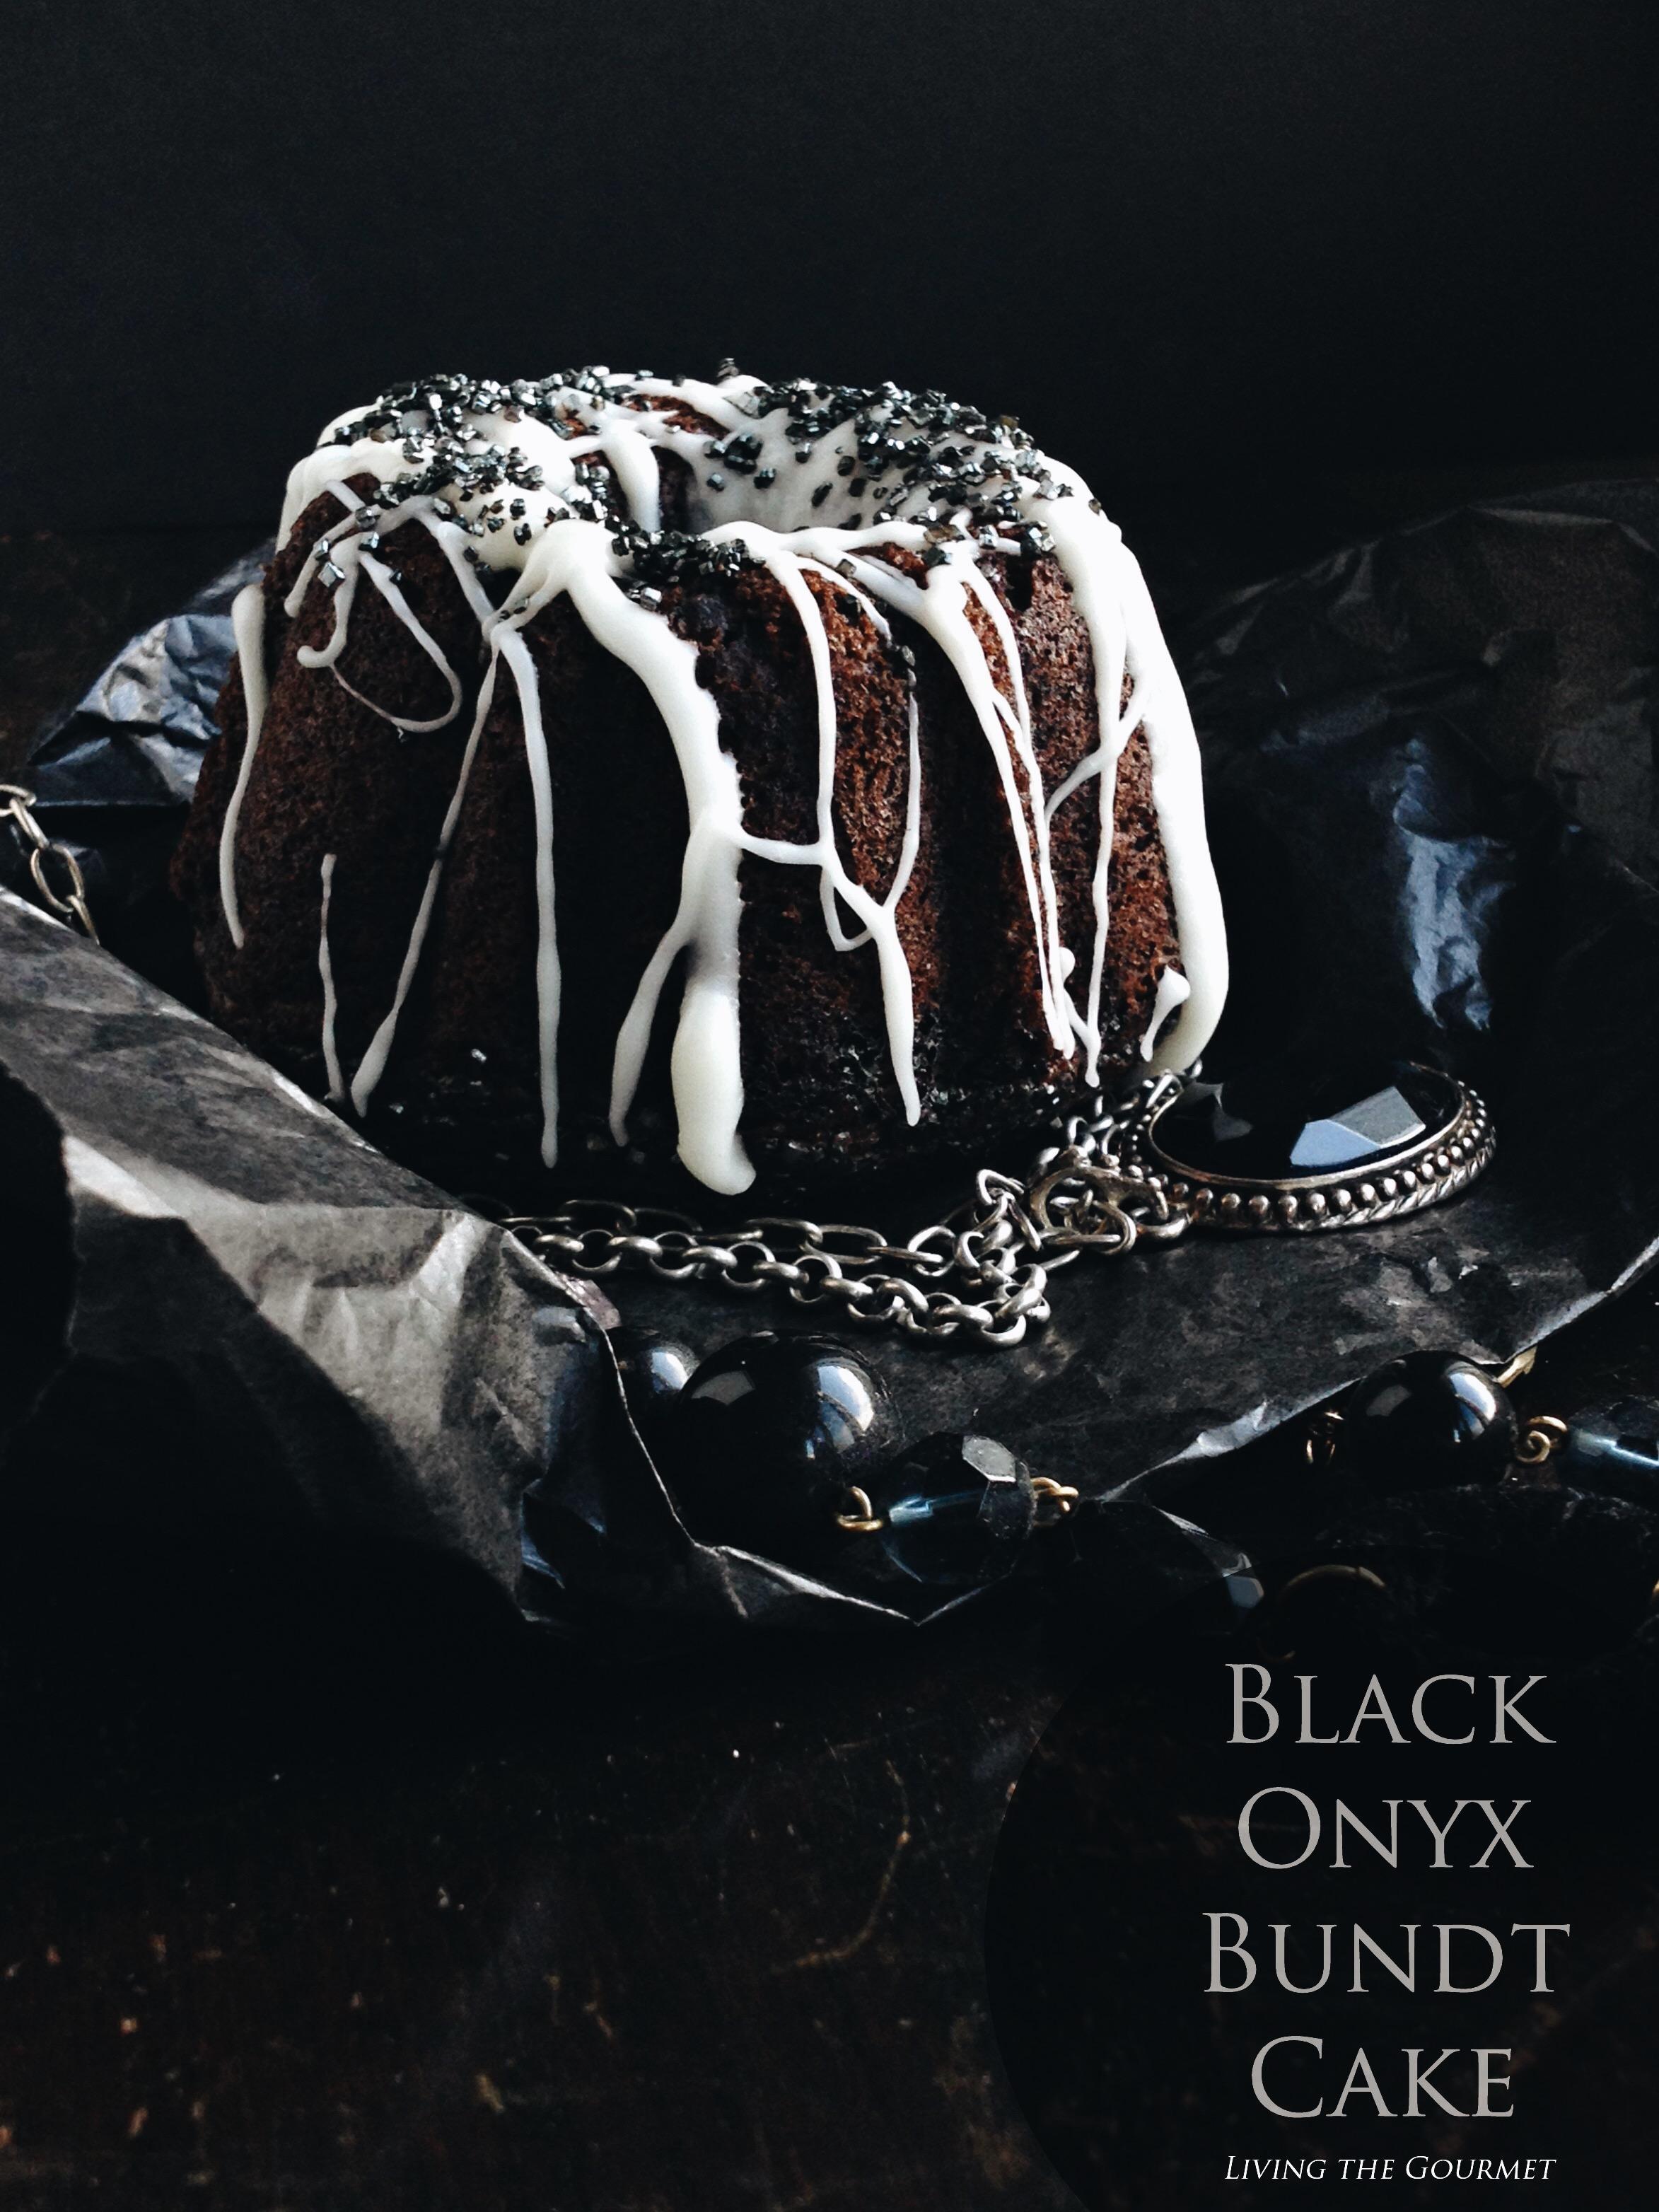 Living the Gourmet: Black Onyx Bundt Cake #BundtBakers